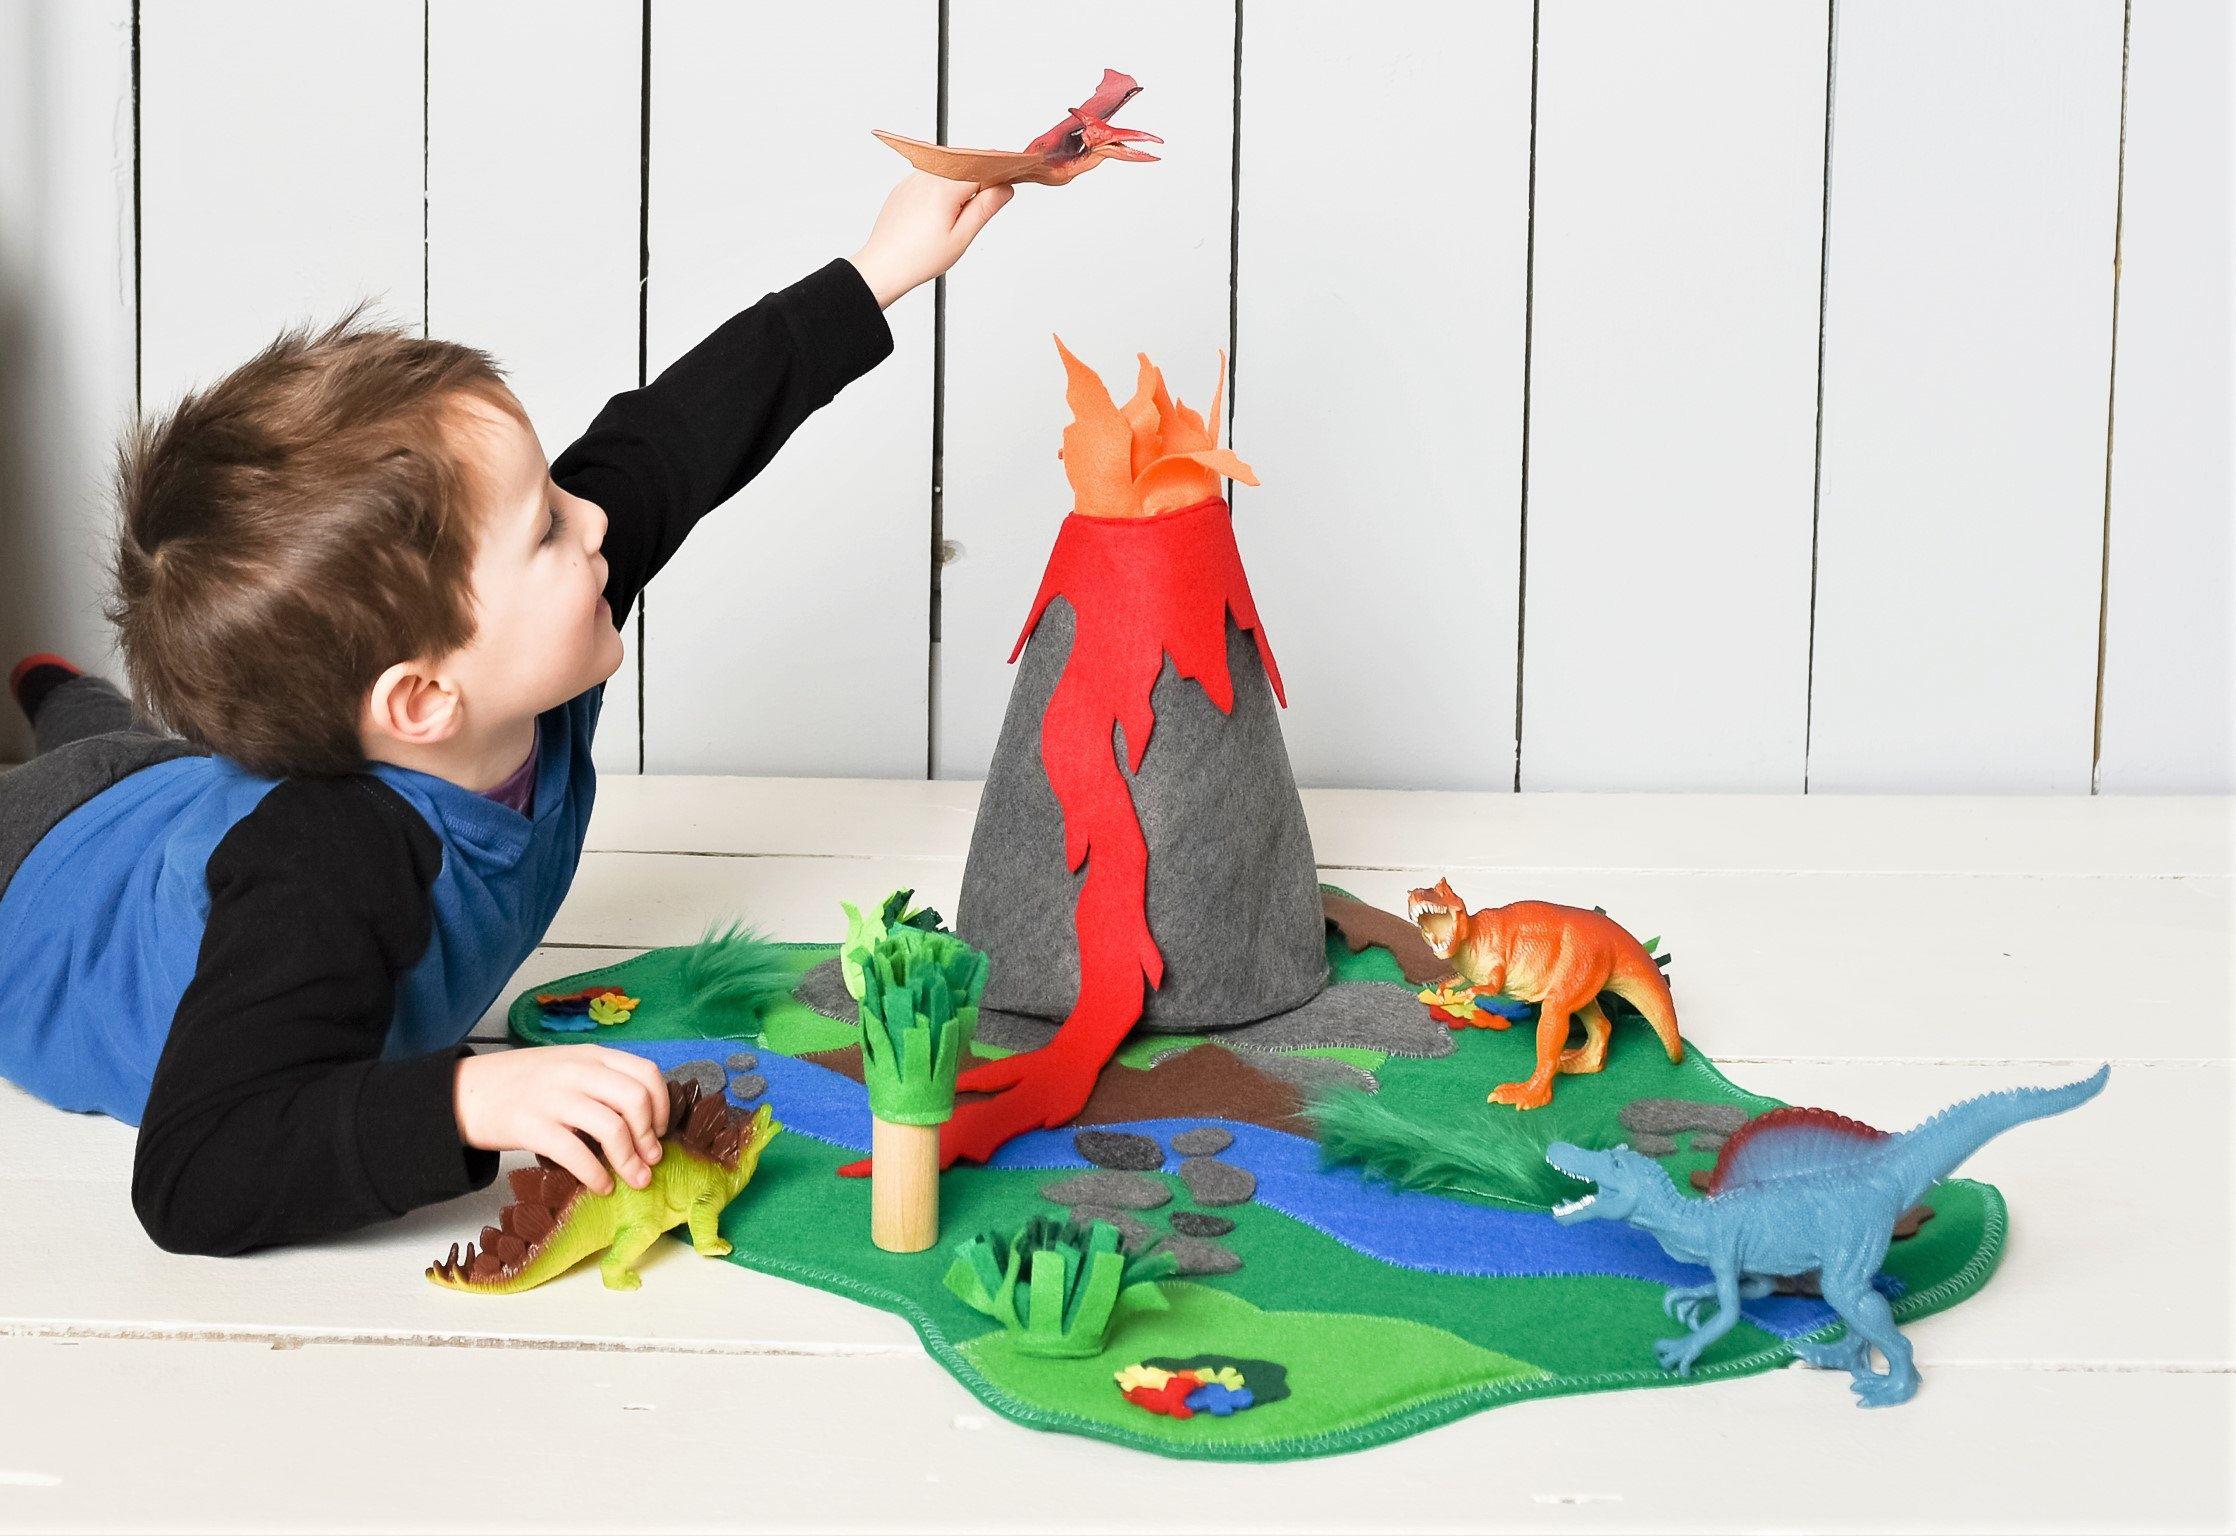 Jursassic World Playmat Volcano Play Mat Dinosaur Land Large Felt Play Mat Includes Everything Floor Play Ma Felt Play Mat Chirstmas Gift Handmade Toys